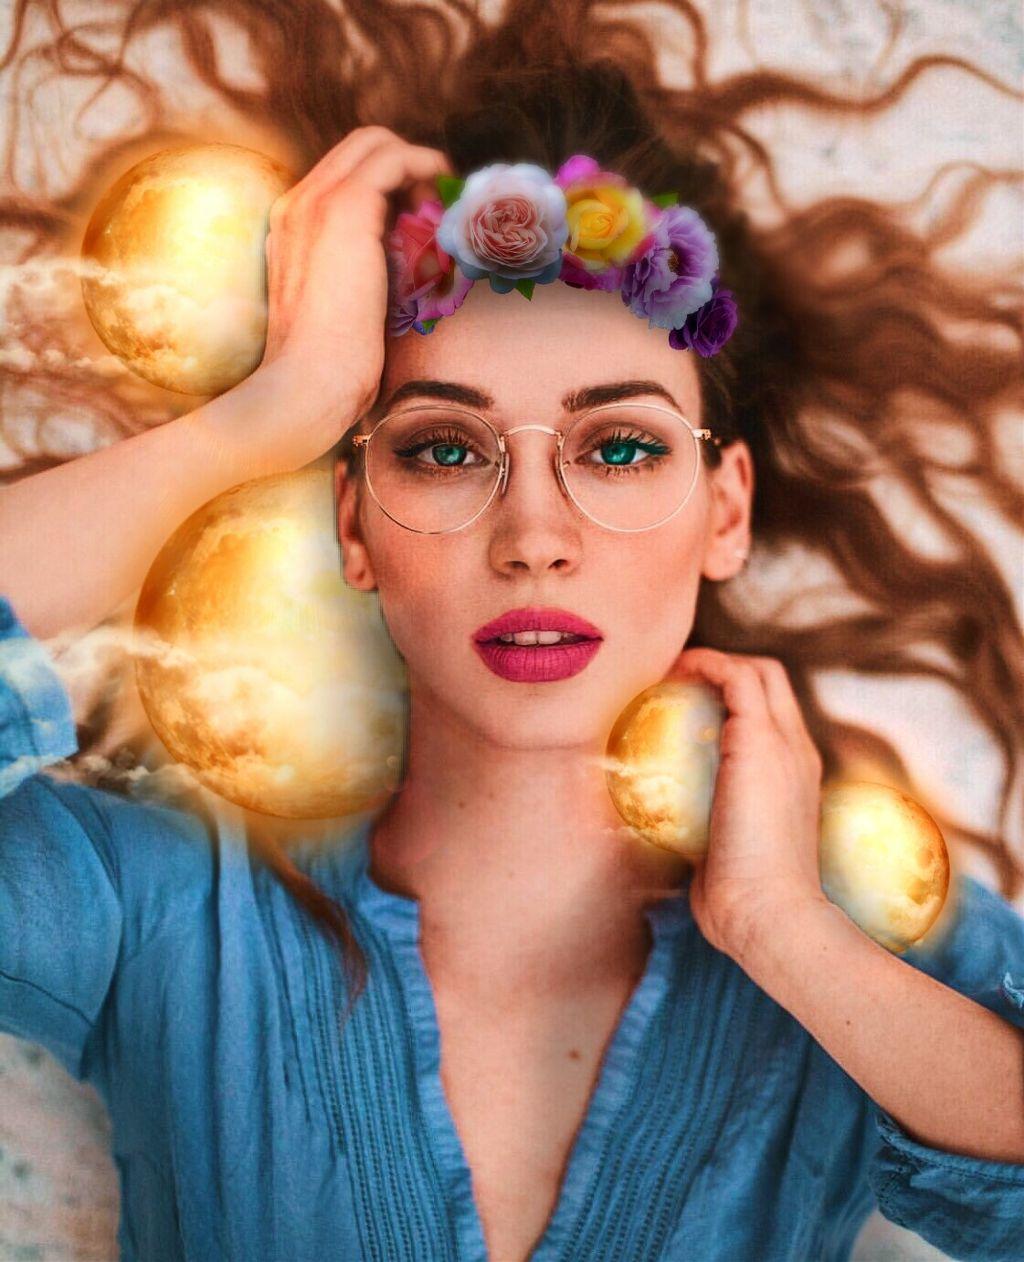 #freetoedit #girl #portrait #moon #lights #lipstick #fridaflowercrown #flowercrown #hawaii #lensflare #beautiful